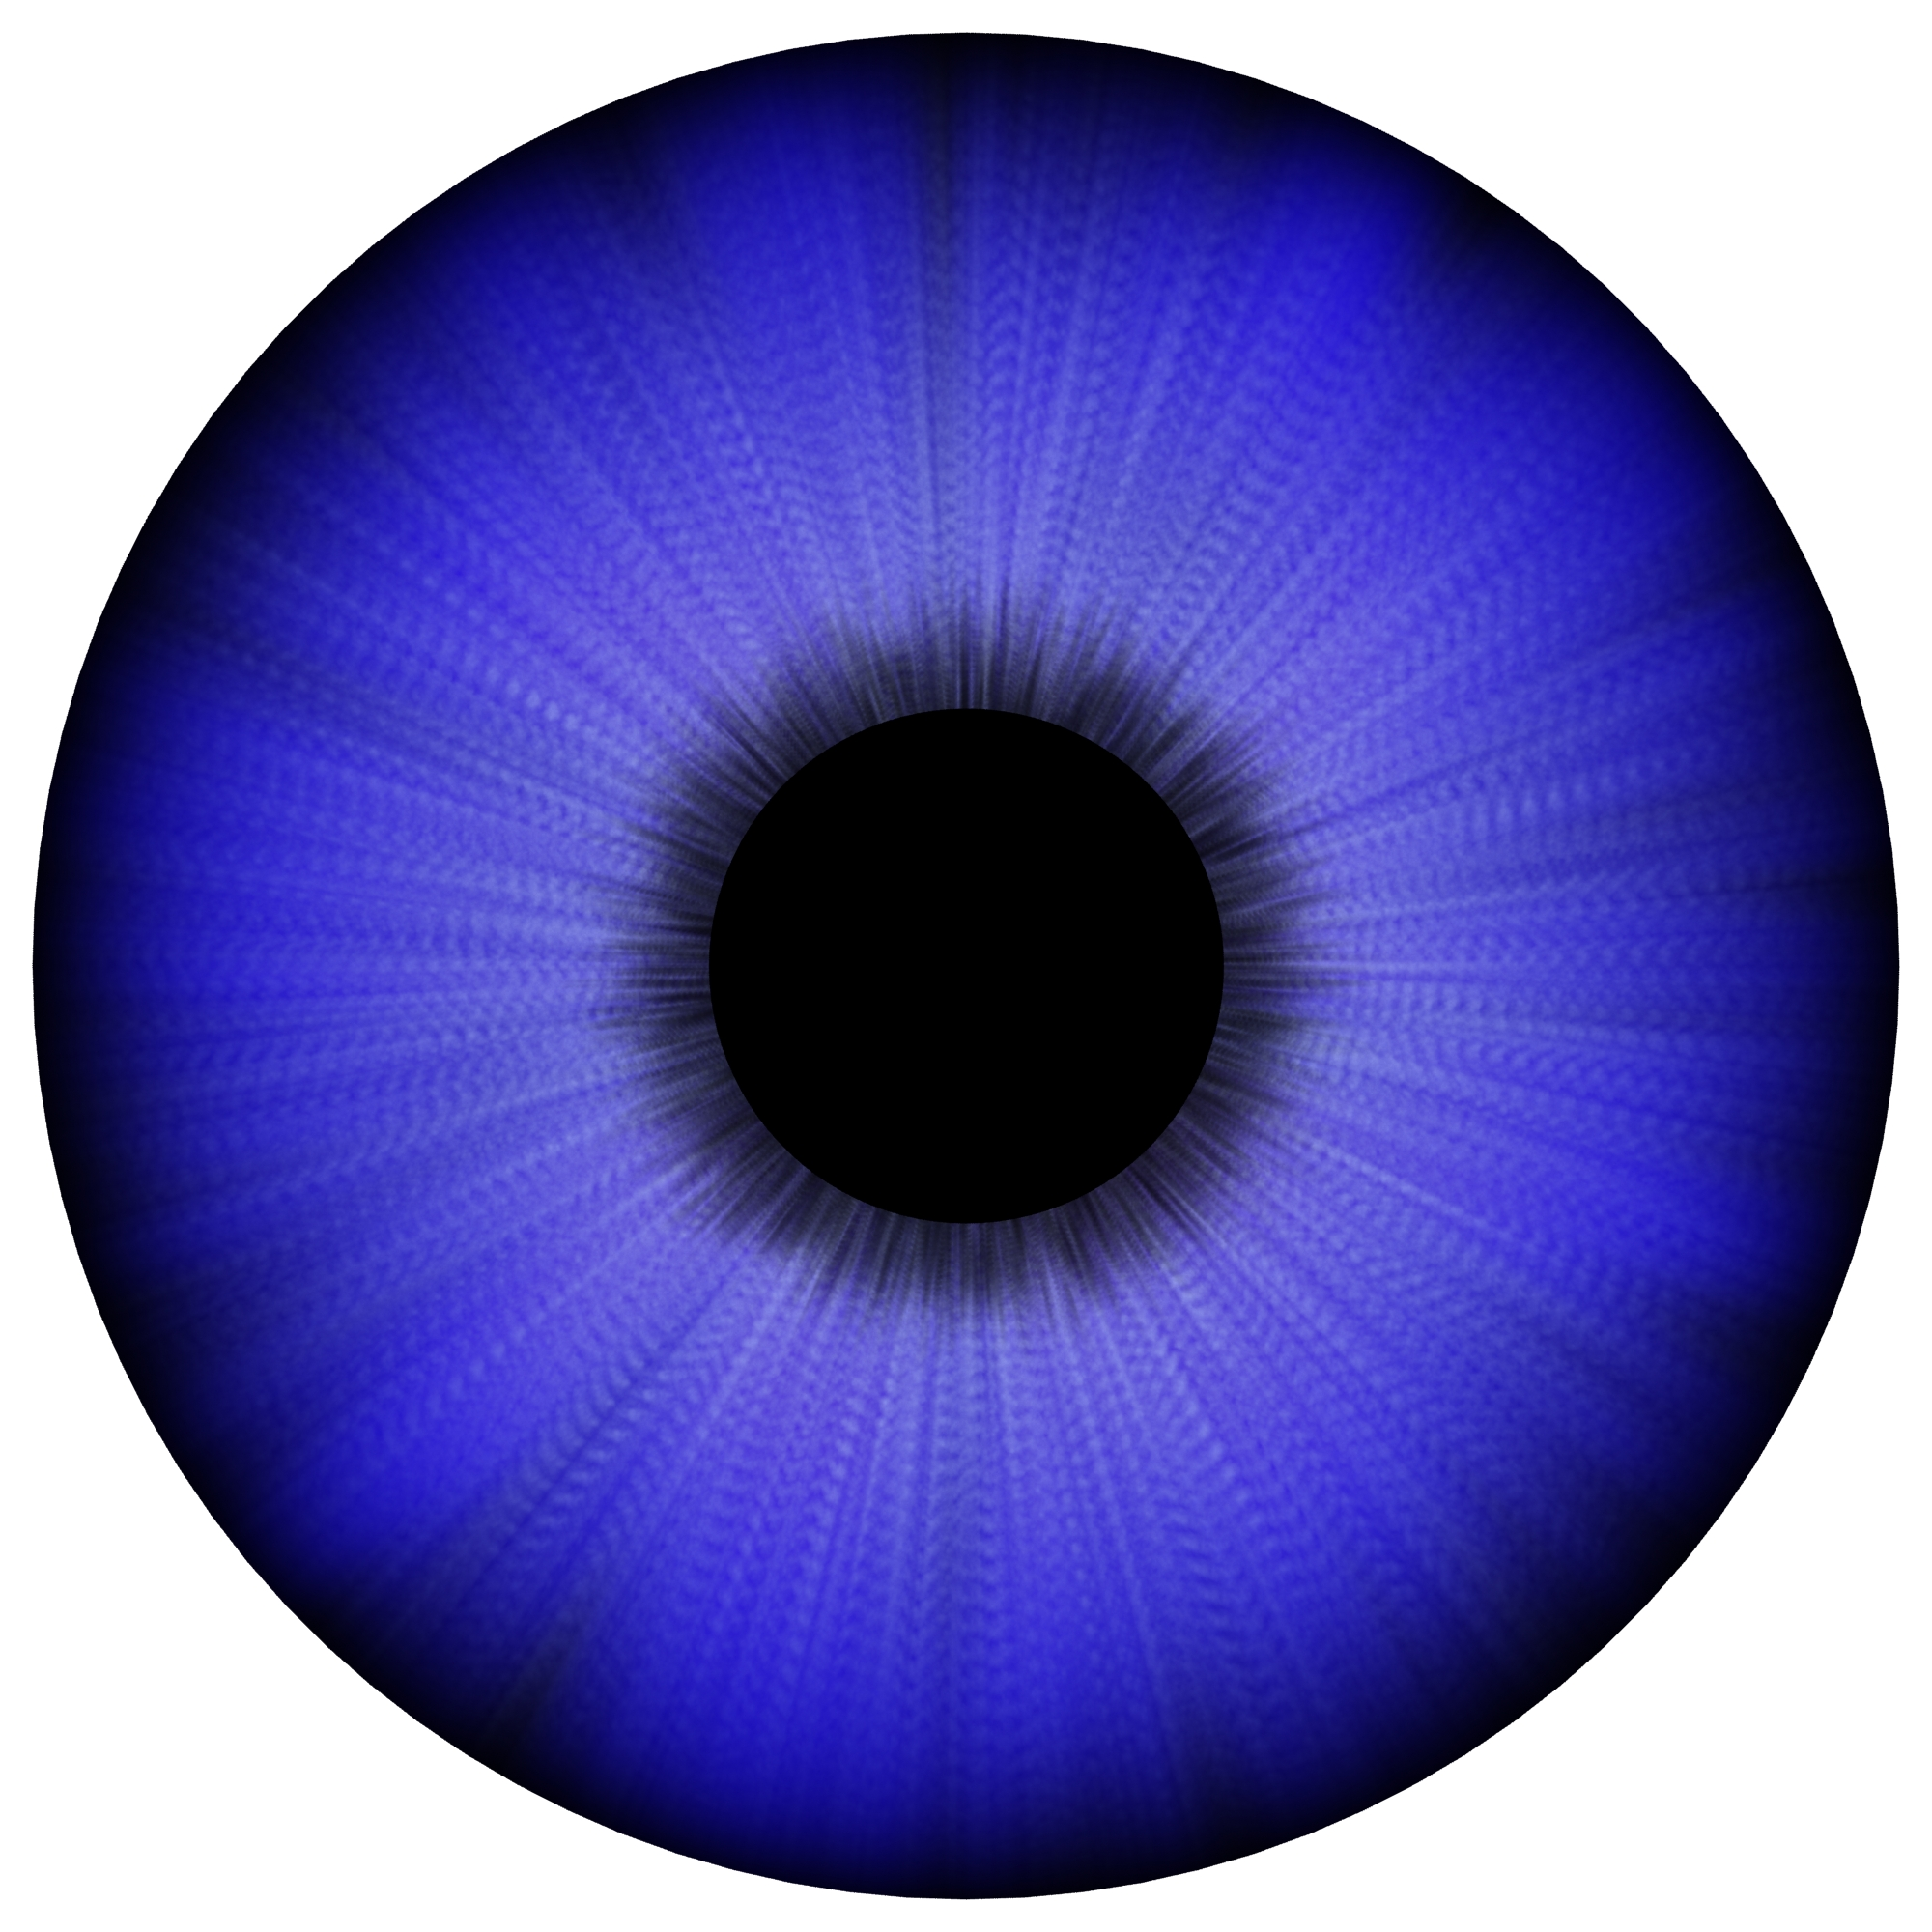 TRUE BLUE eye texture